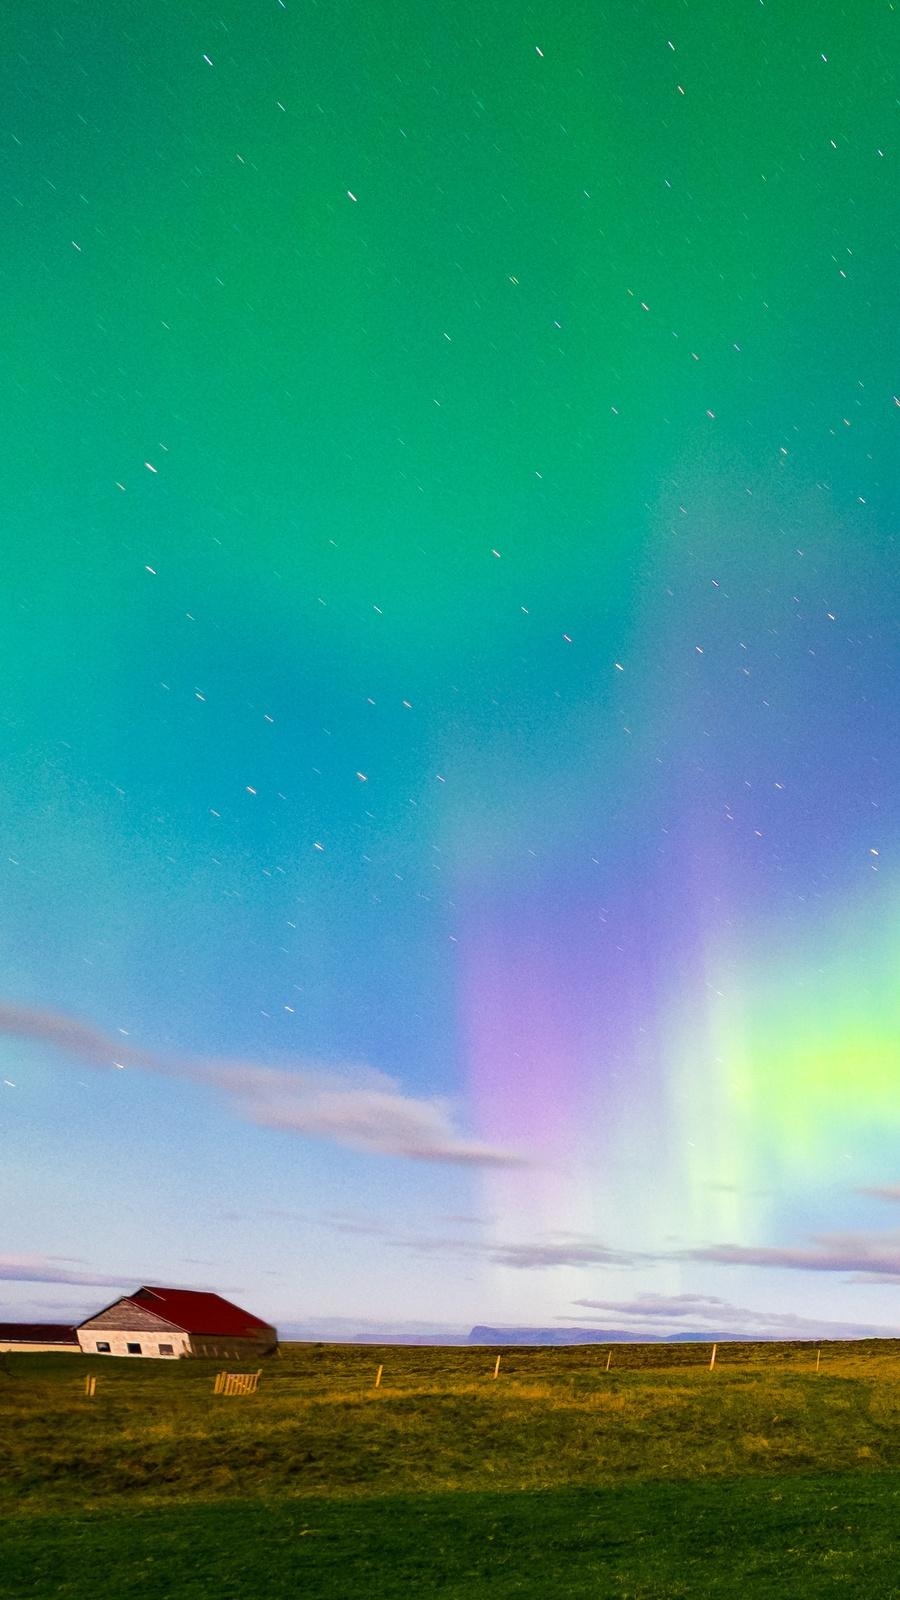 Iceland aurora borealis northern lights iphone wallpaper - Iceland iphone wallpaper ...